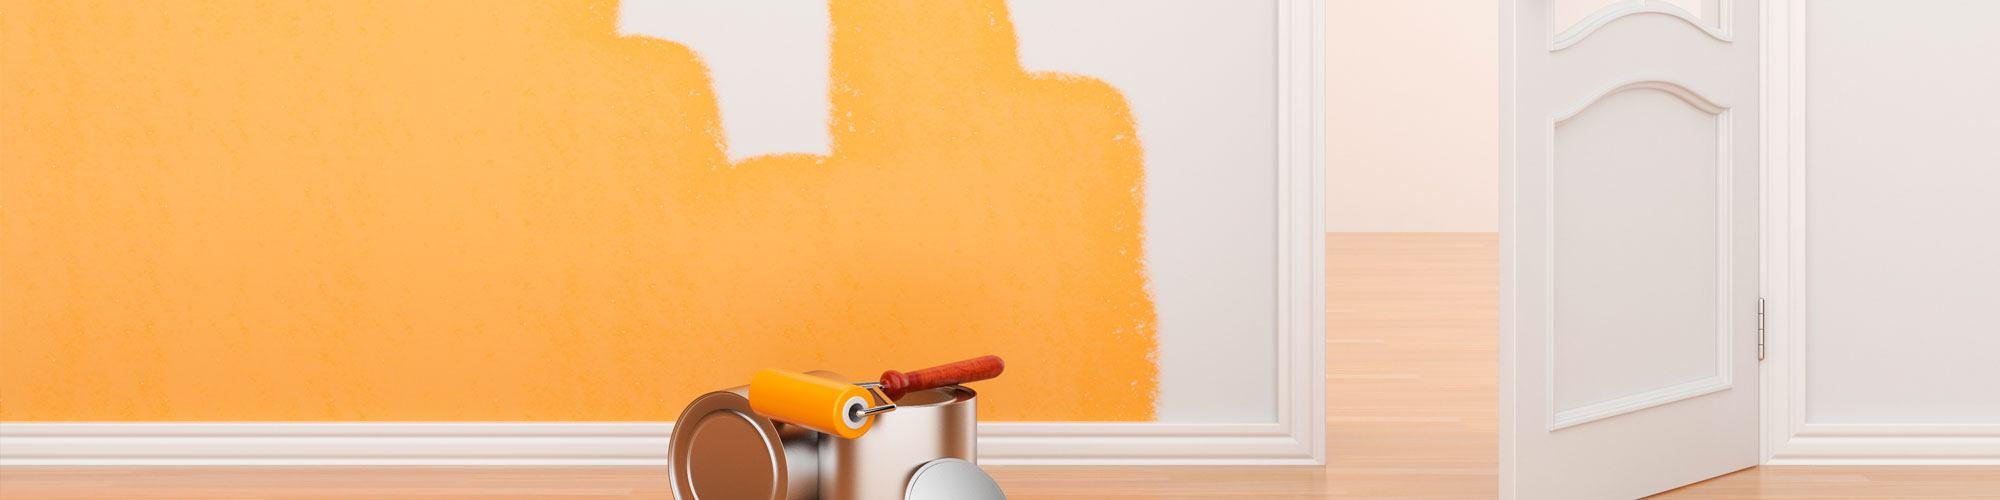 painting services orlando fl